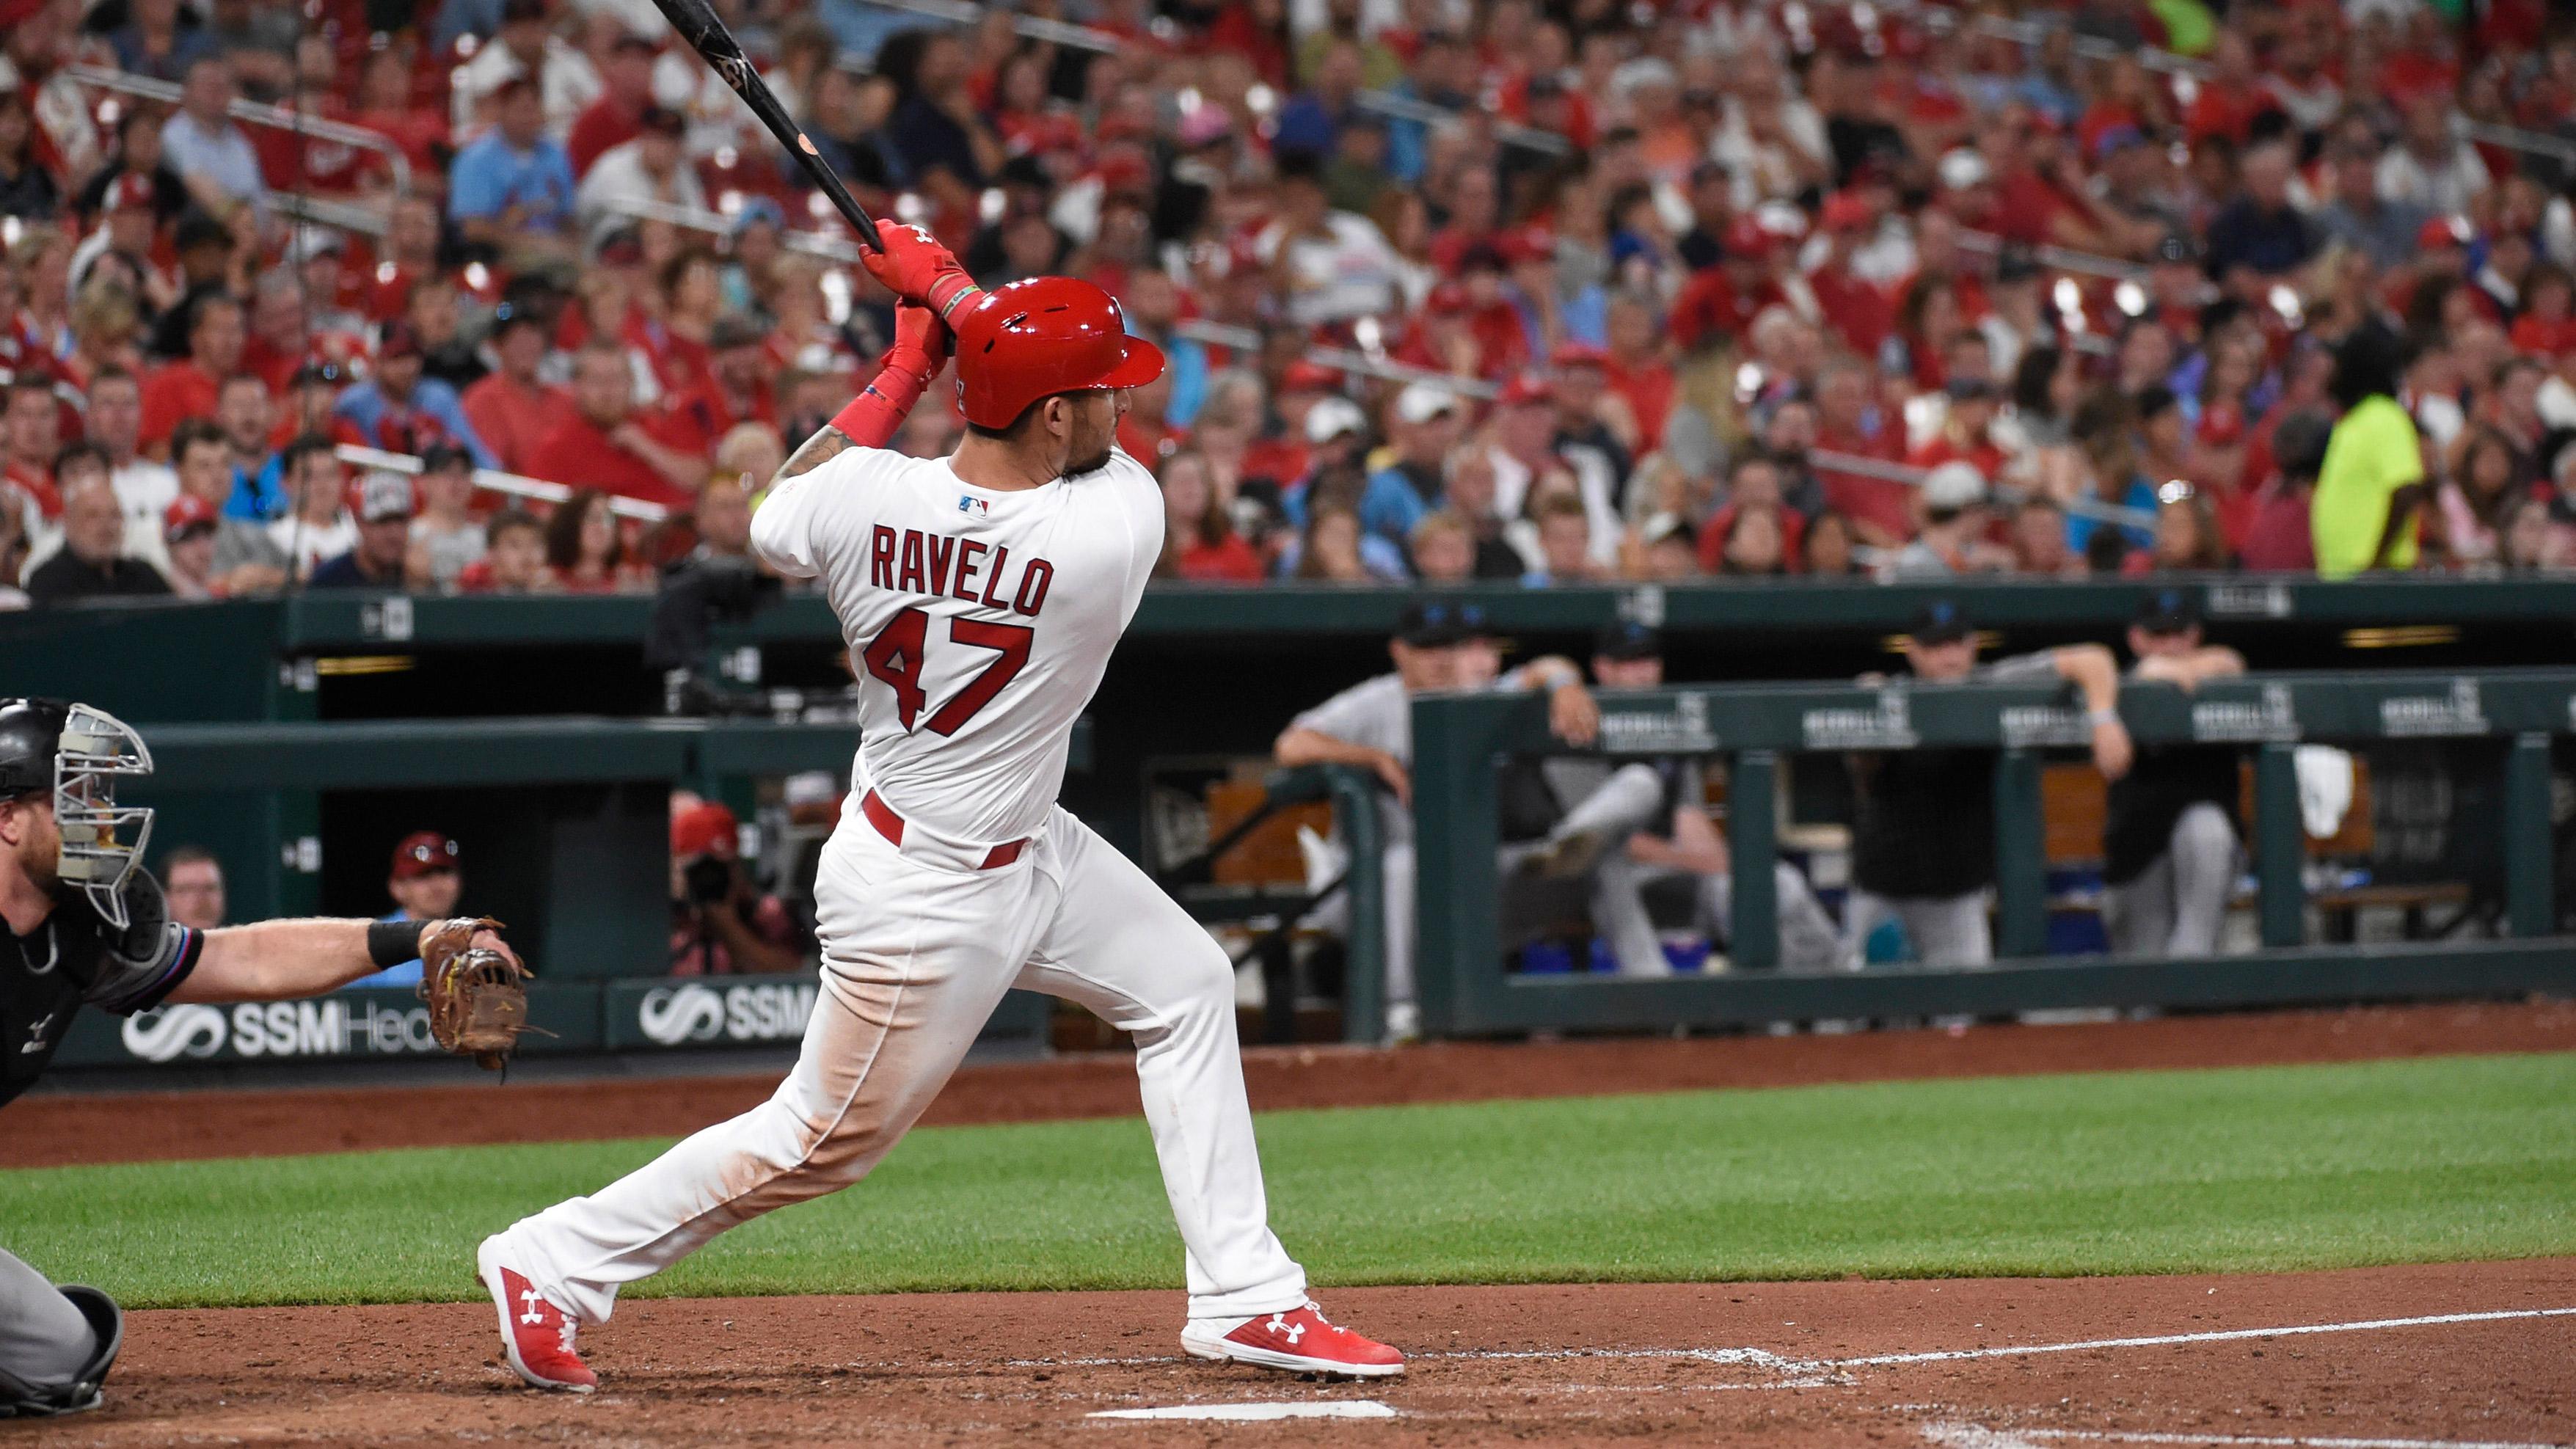 Cardinals recall Ravelo, option Thomas to Memphis